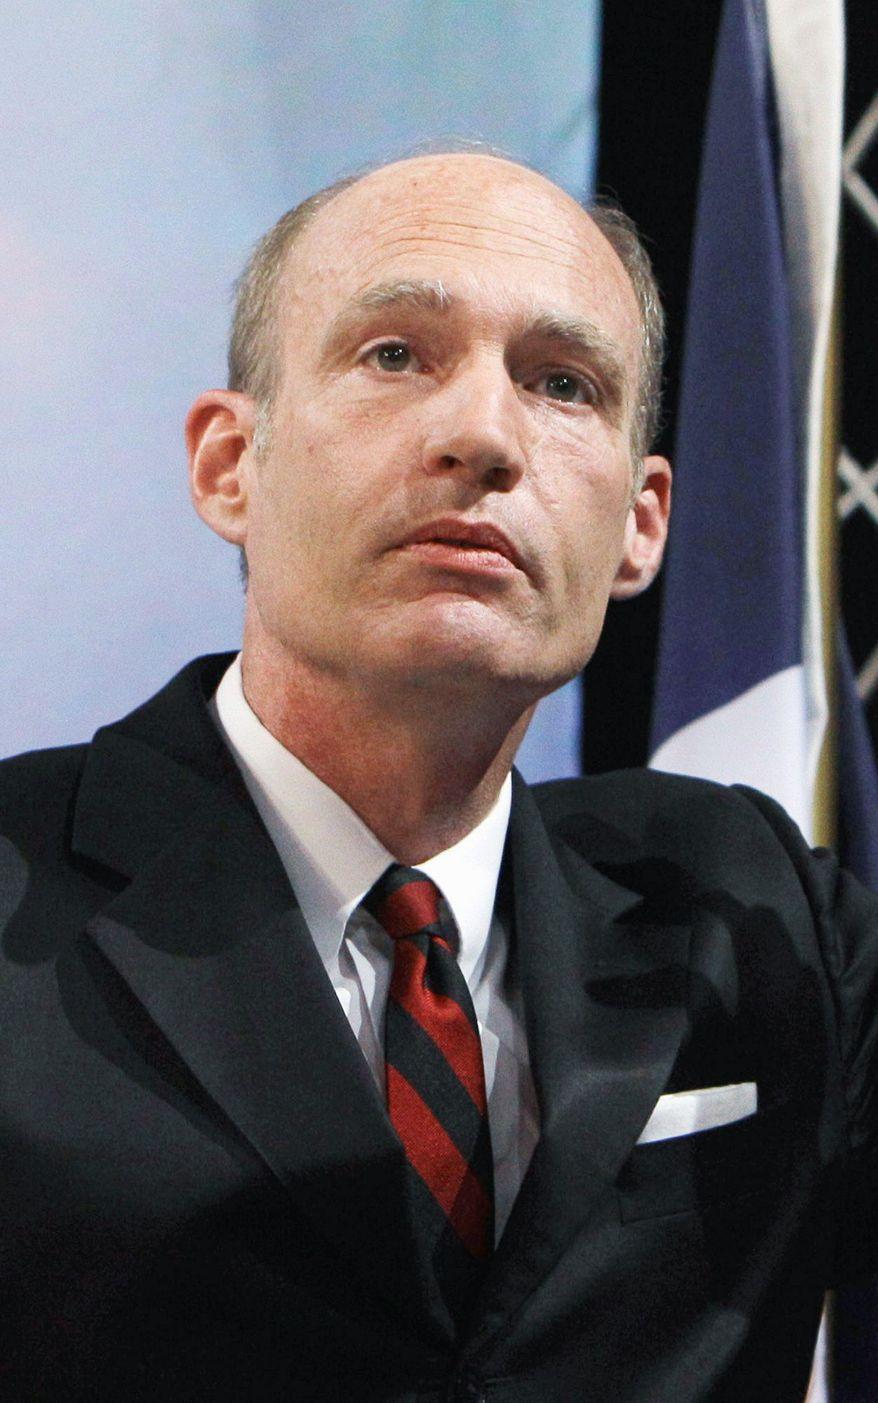 Rep. Thaddeus G. McCotter, Michigan Republican